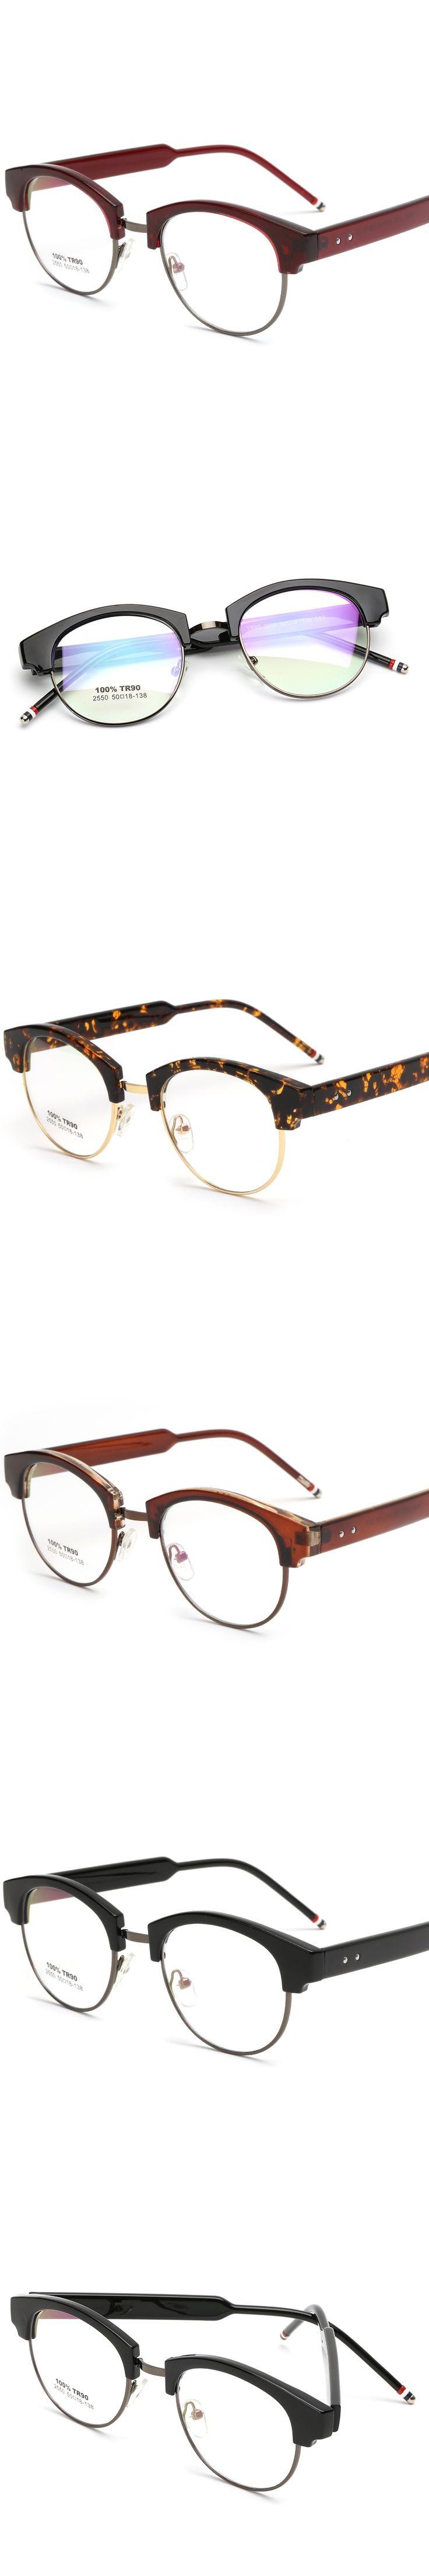 2017 Fashion Unisex  TR90 Highlight Oval Frame Vintage Style High Quality Glasses Frame Laura Fairy LF2550